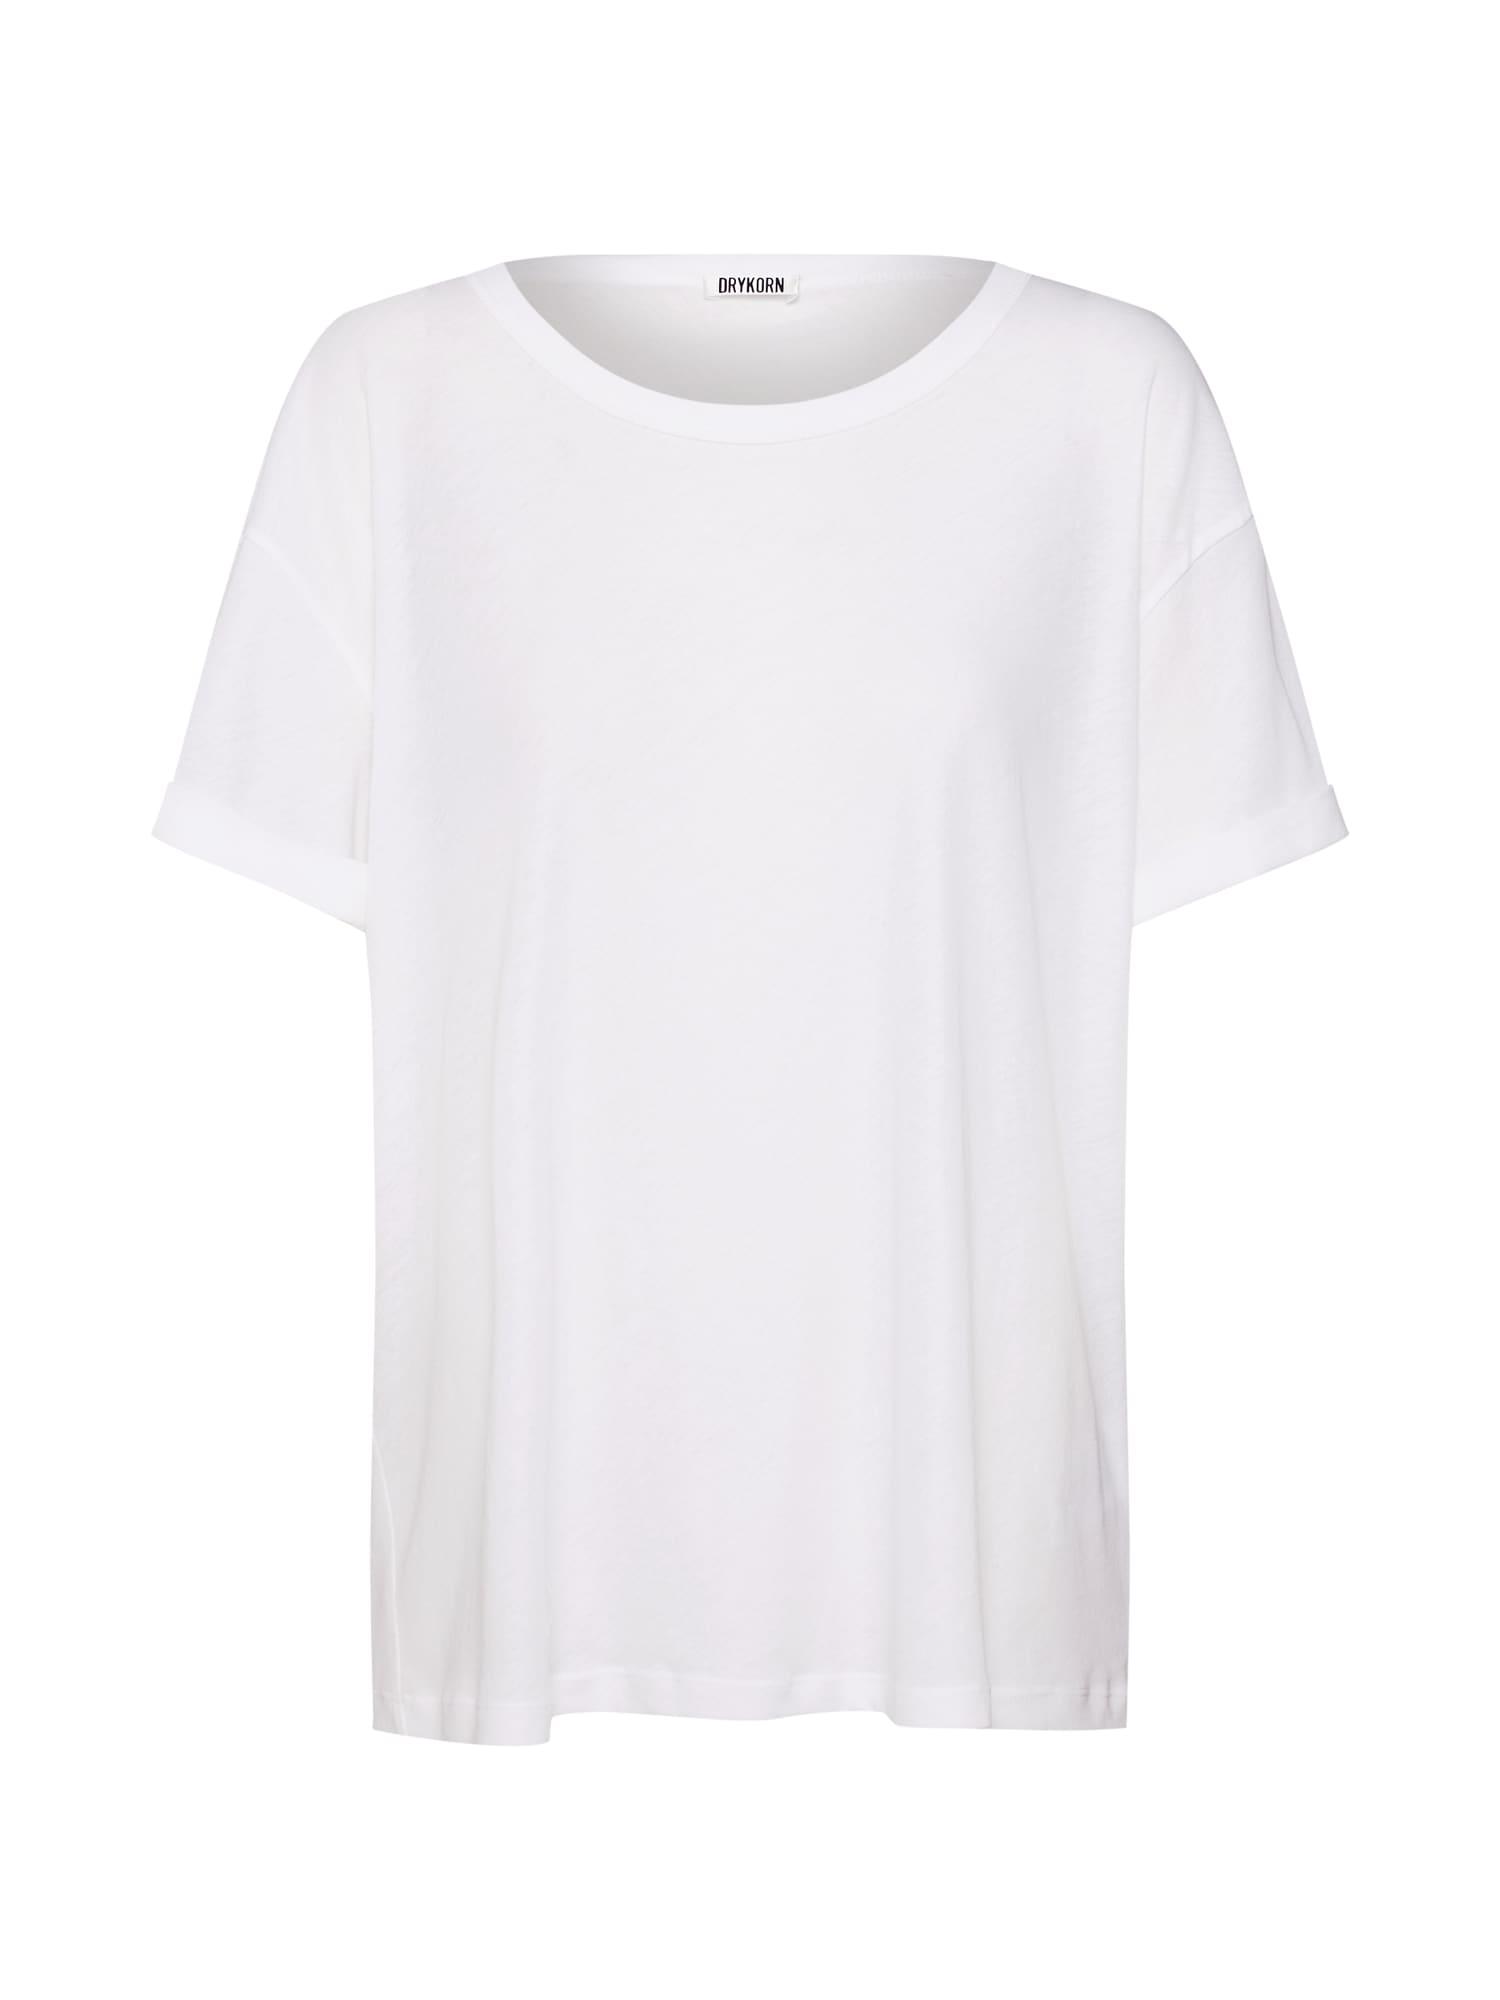 Oversized tričko LARIMA bílá DRYKORN